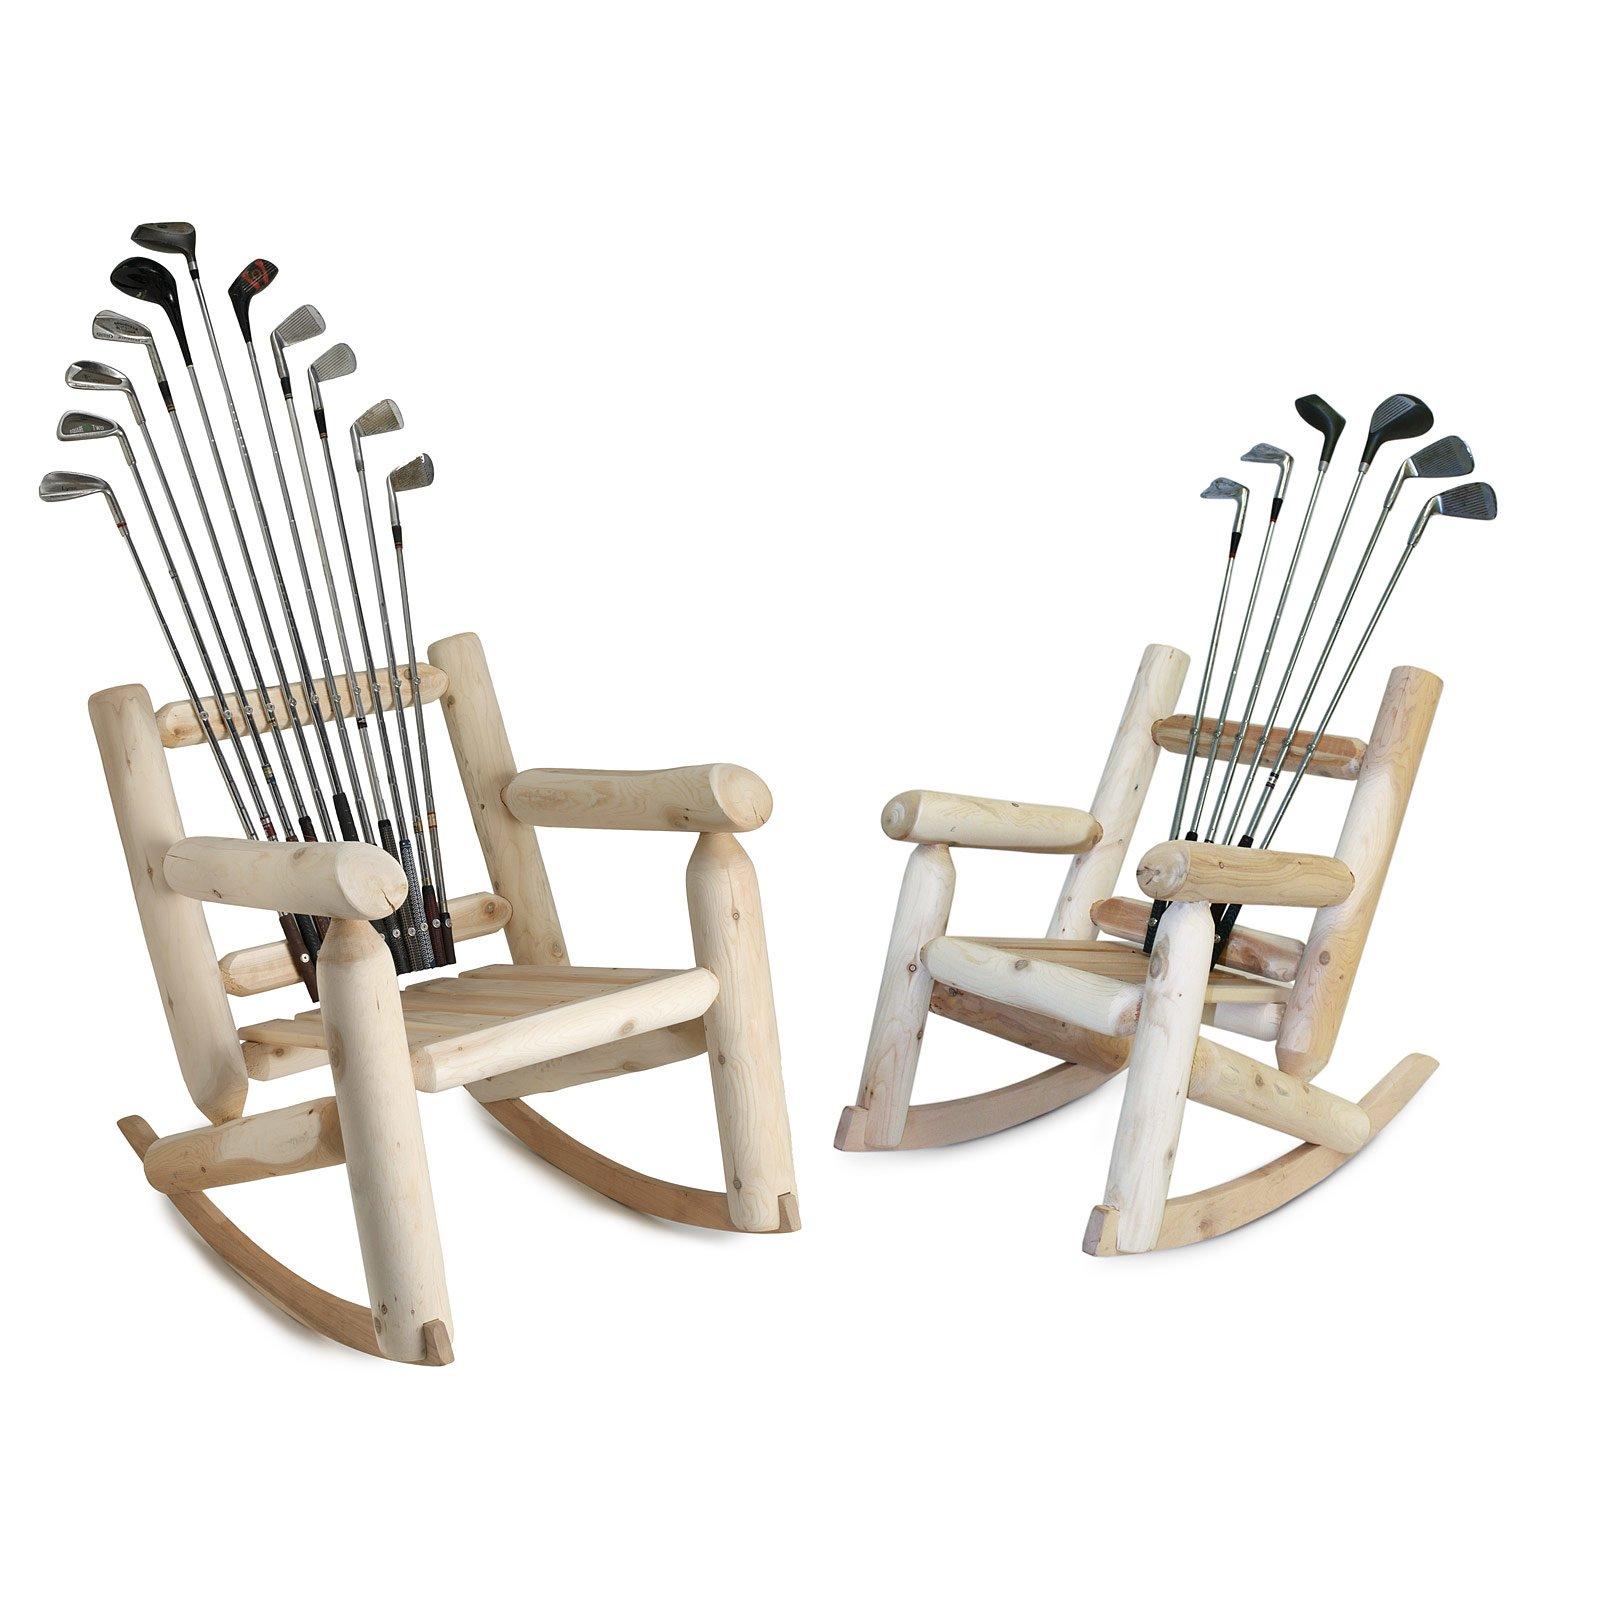 Golf Club Rockers 1 thumbnail  sc 1 st  UncommonGoods & Golf Club Rockers | Irons Woods Cedar Rocking Chair | UncommonGoods